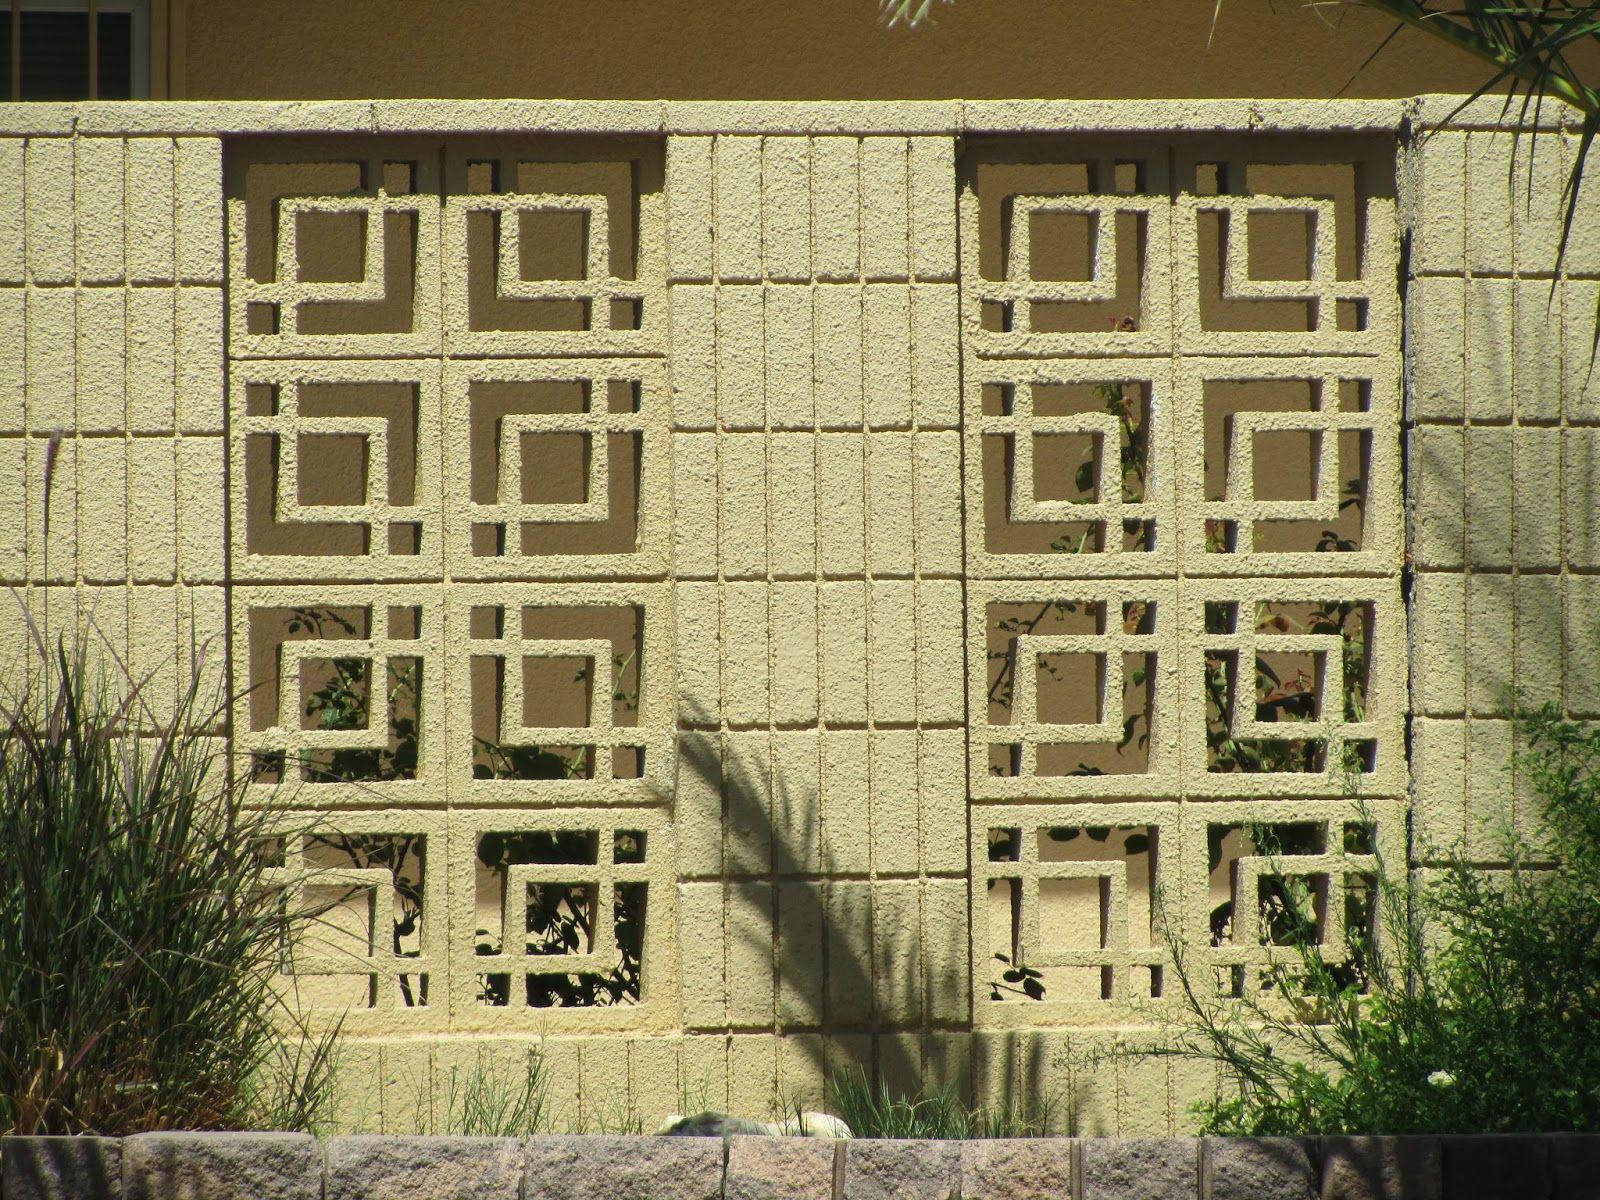 Paradise Palms Entry Wall at Spencer Street & Seneca Dr/Nahatan Way ...